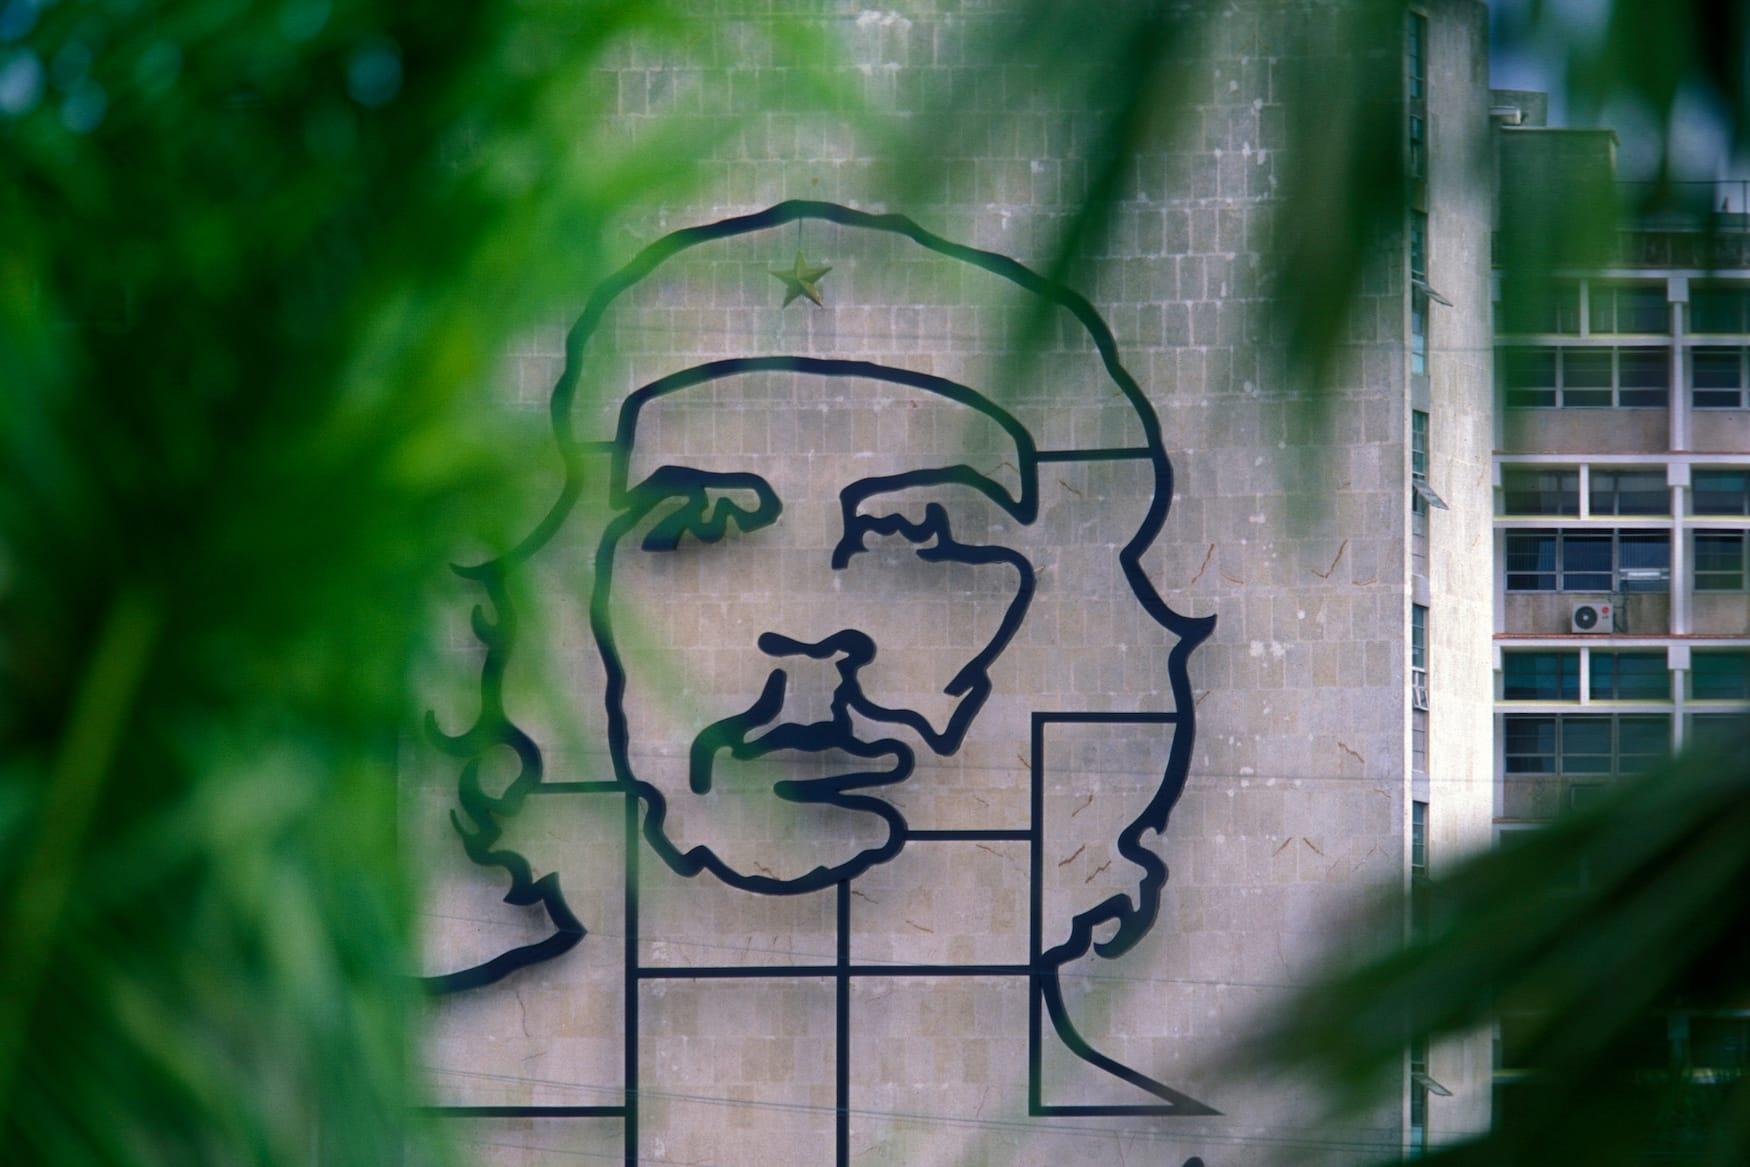 Che Guevara Denkmal an Häuserwand in Havanna, Kuba